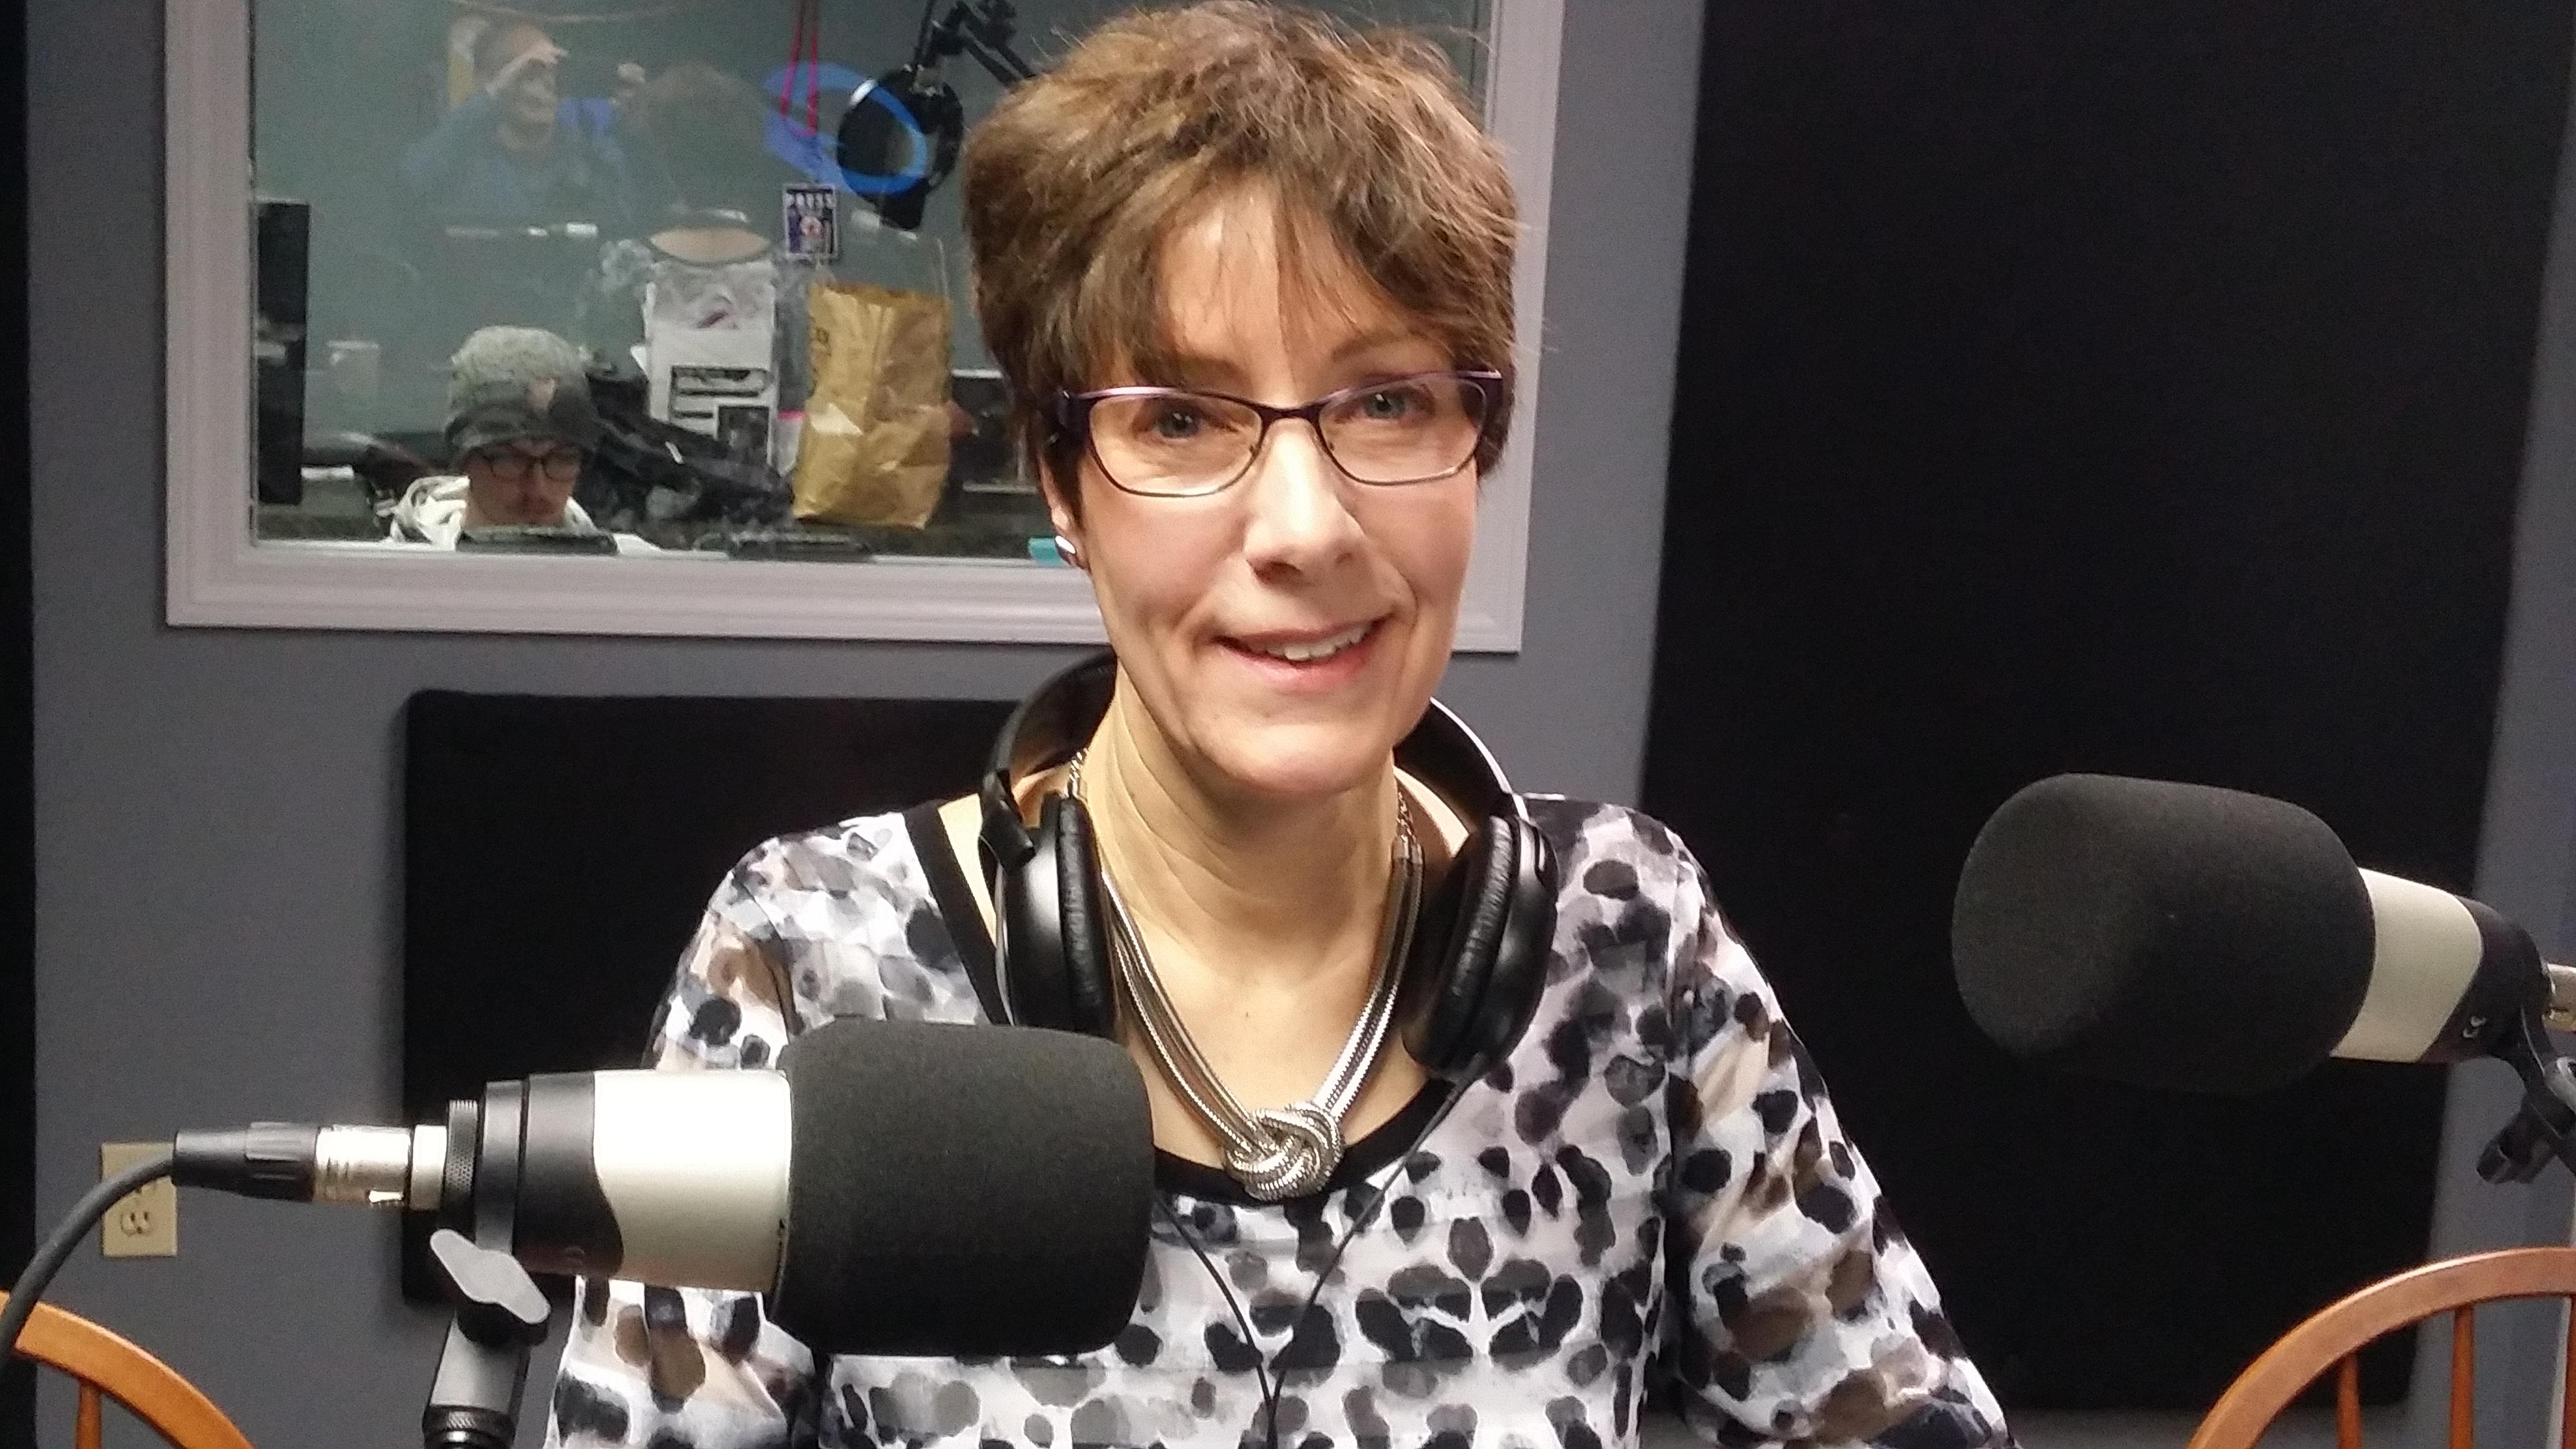 Timberlane Regional School Board Member Donna Green